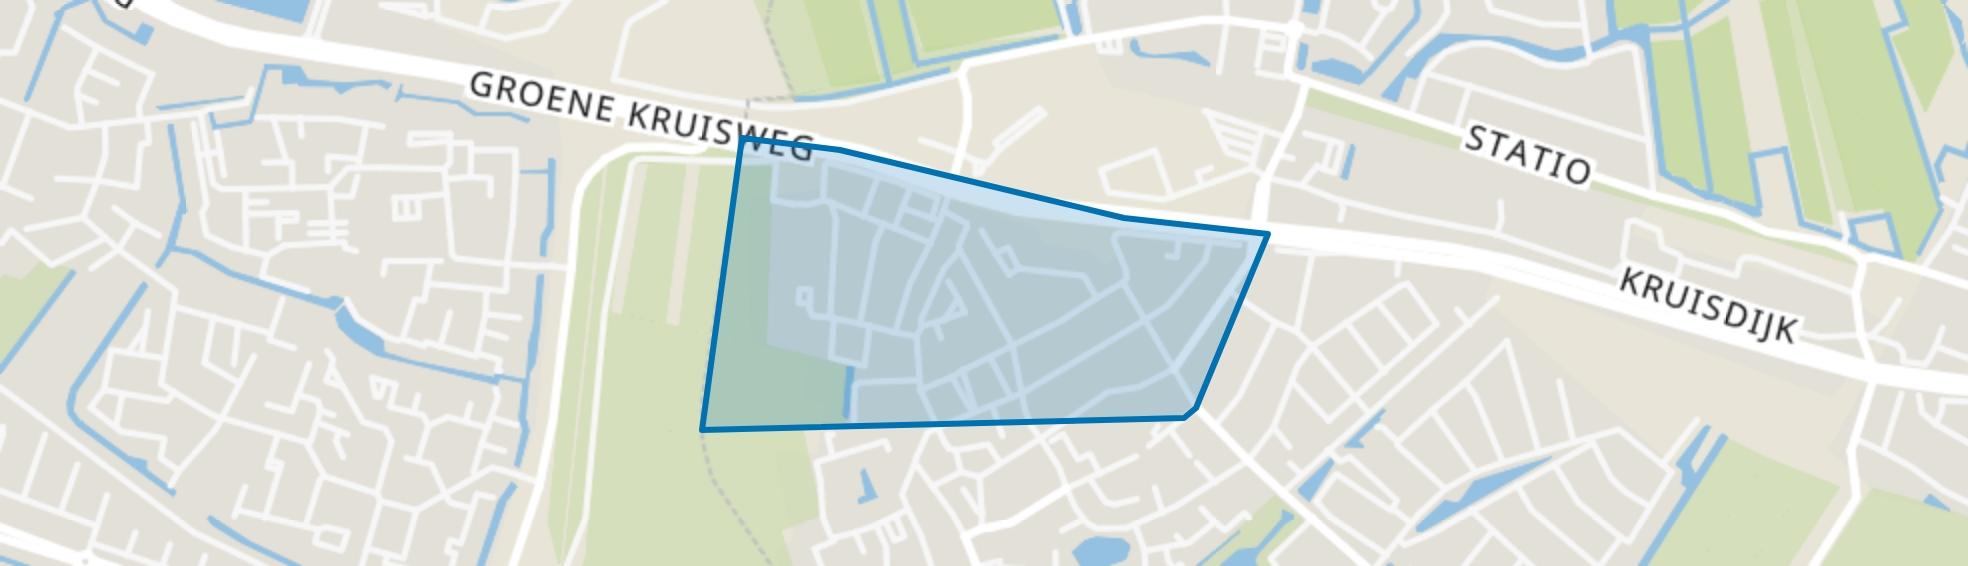 Beatrixstraat, Poortugaal map